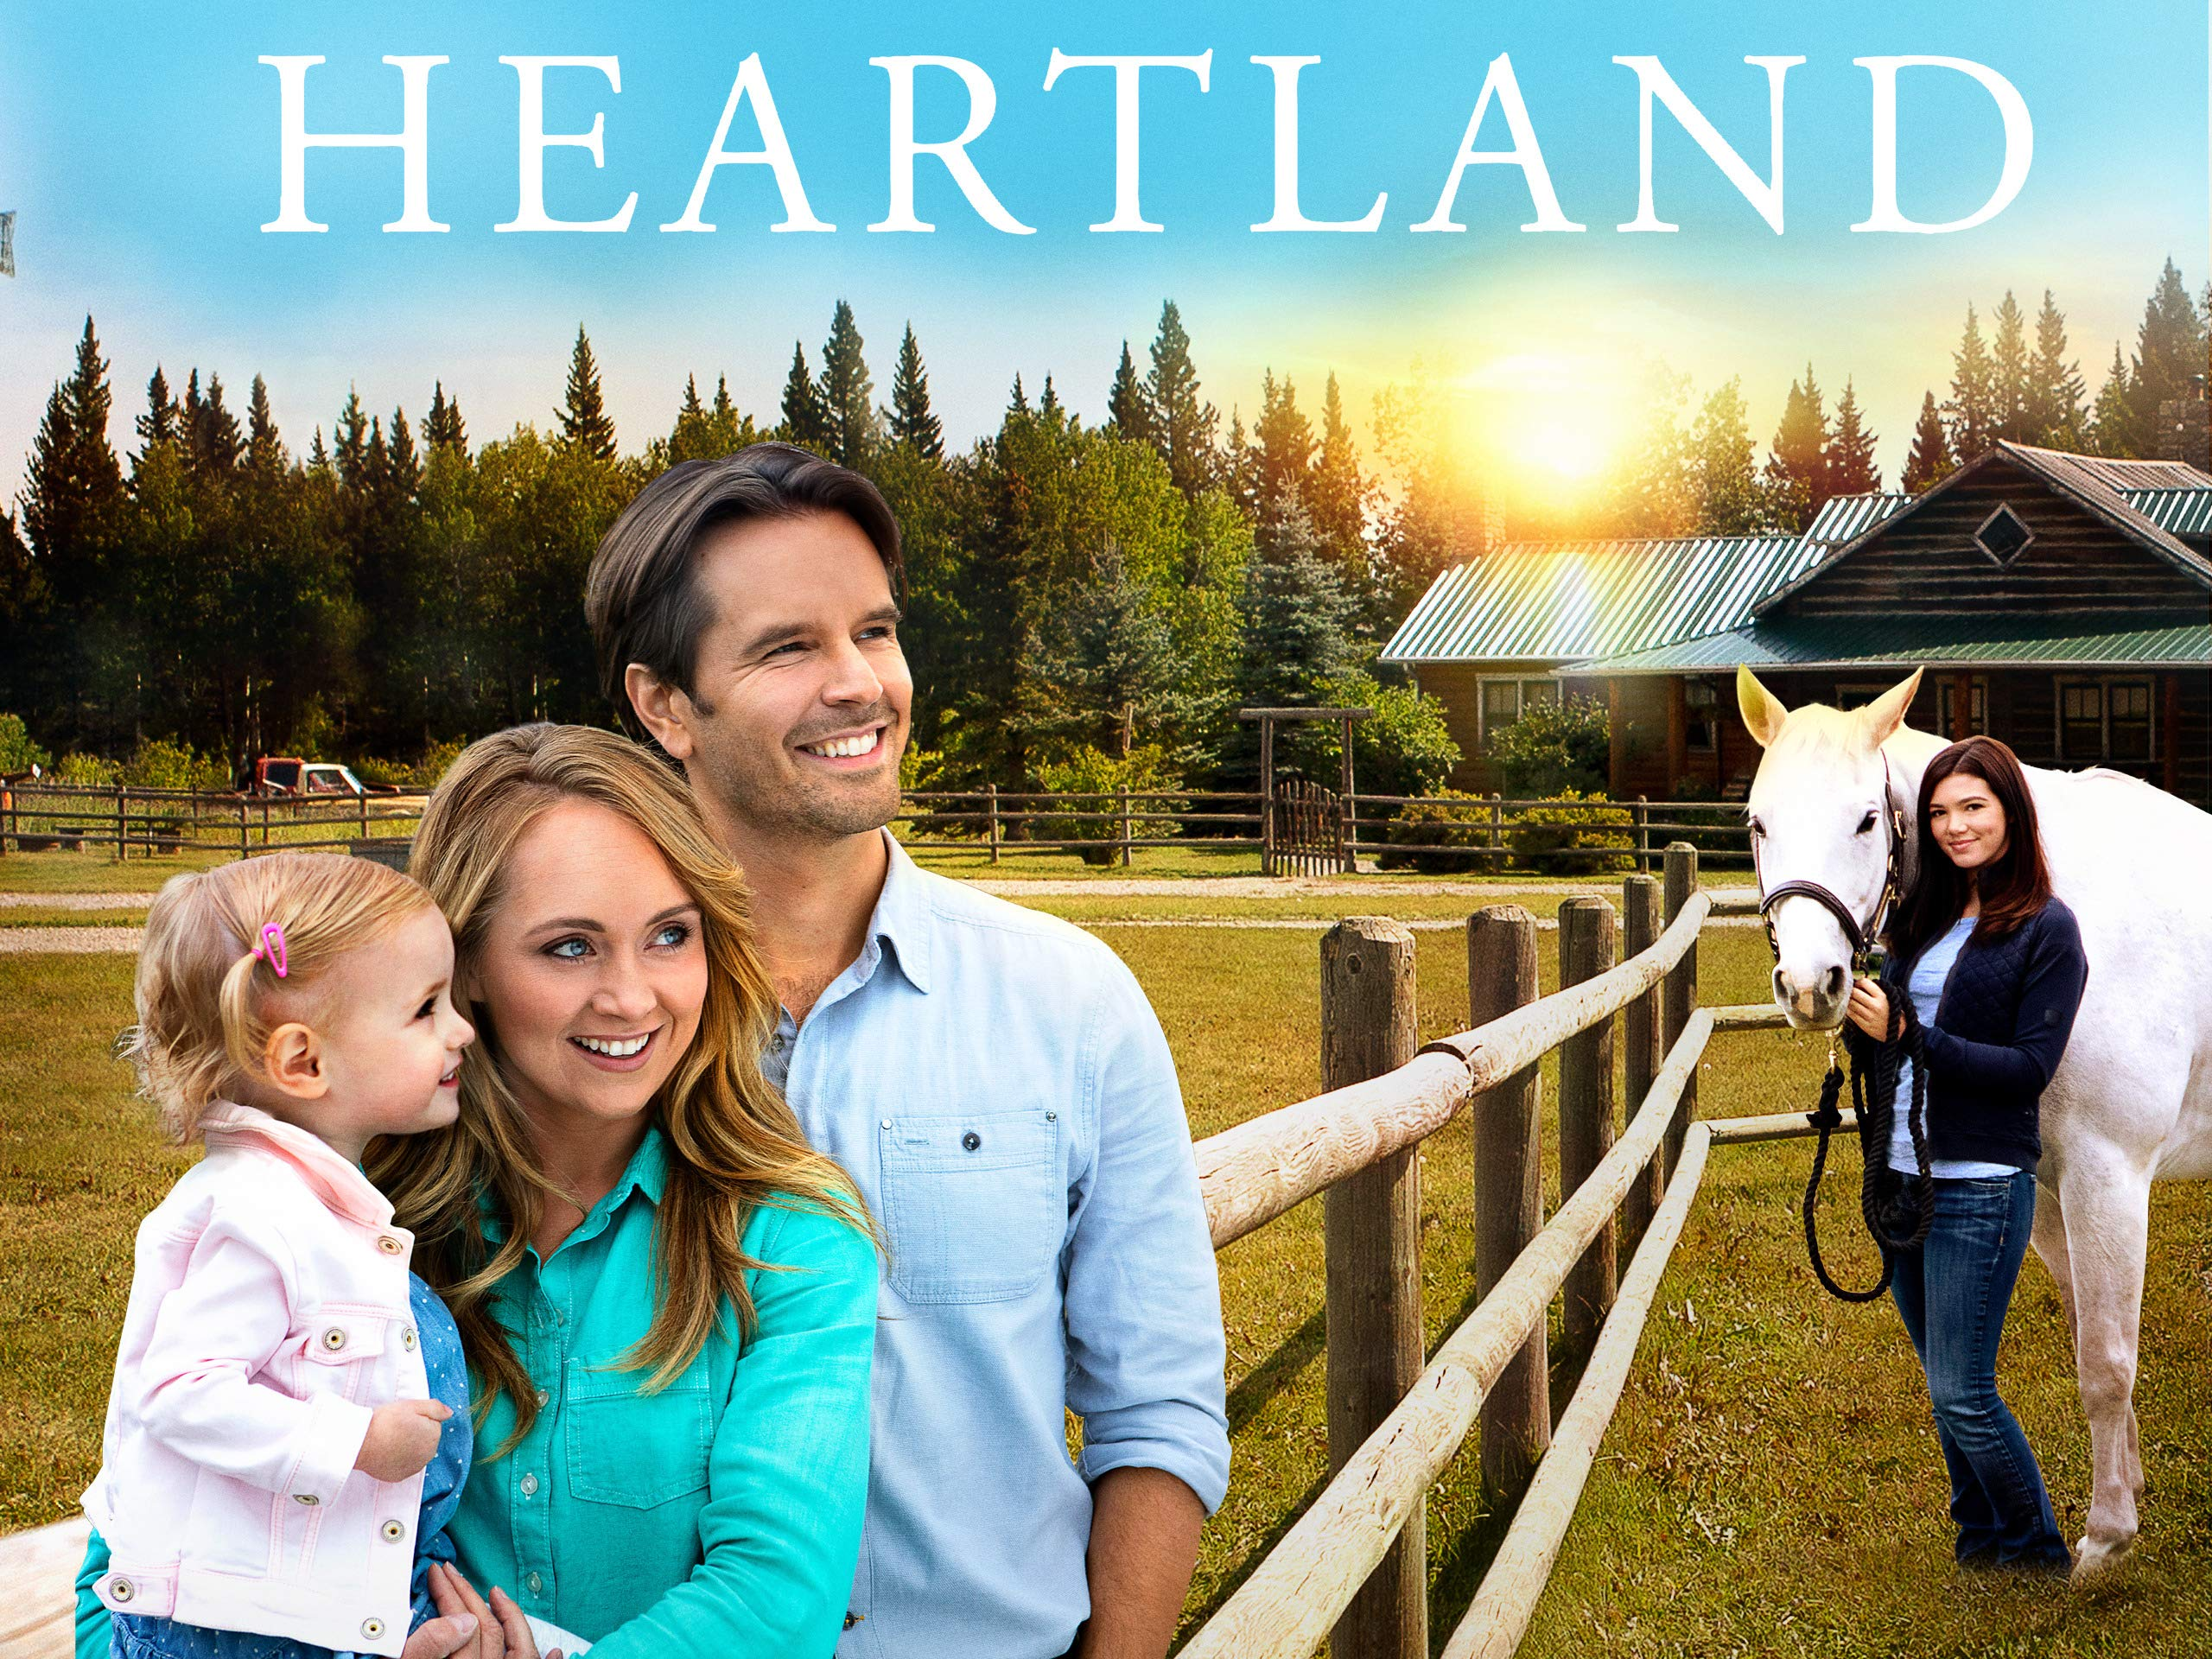 heartland cast season 12